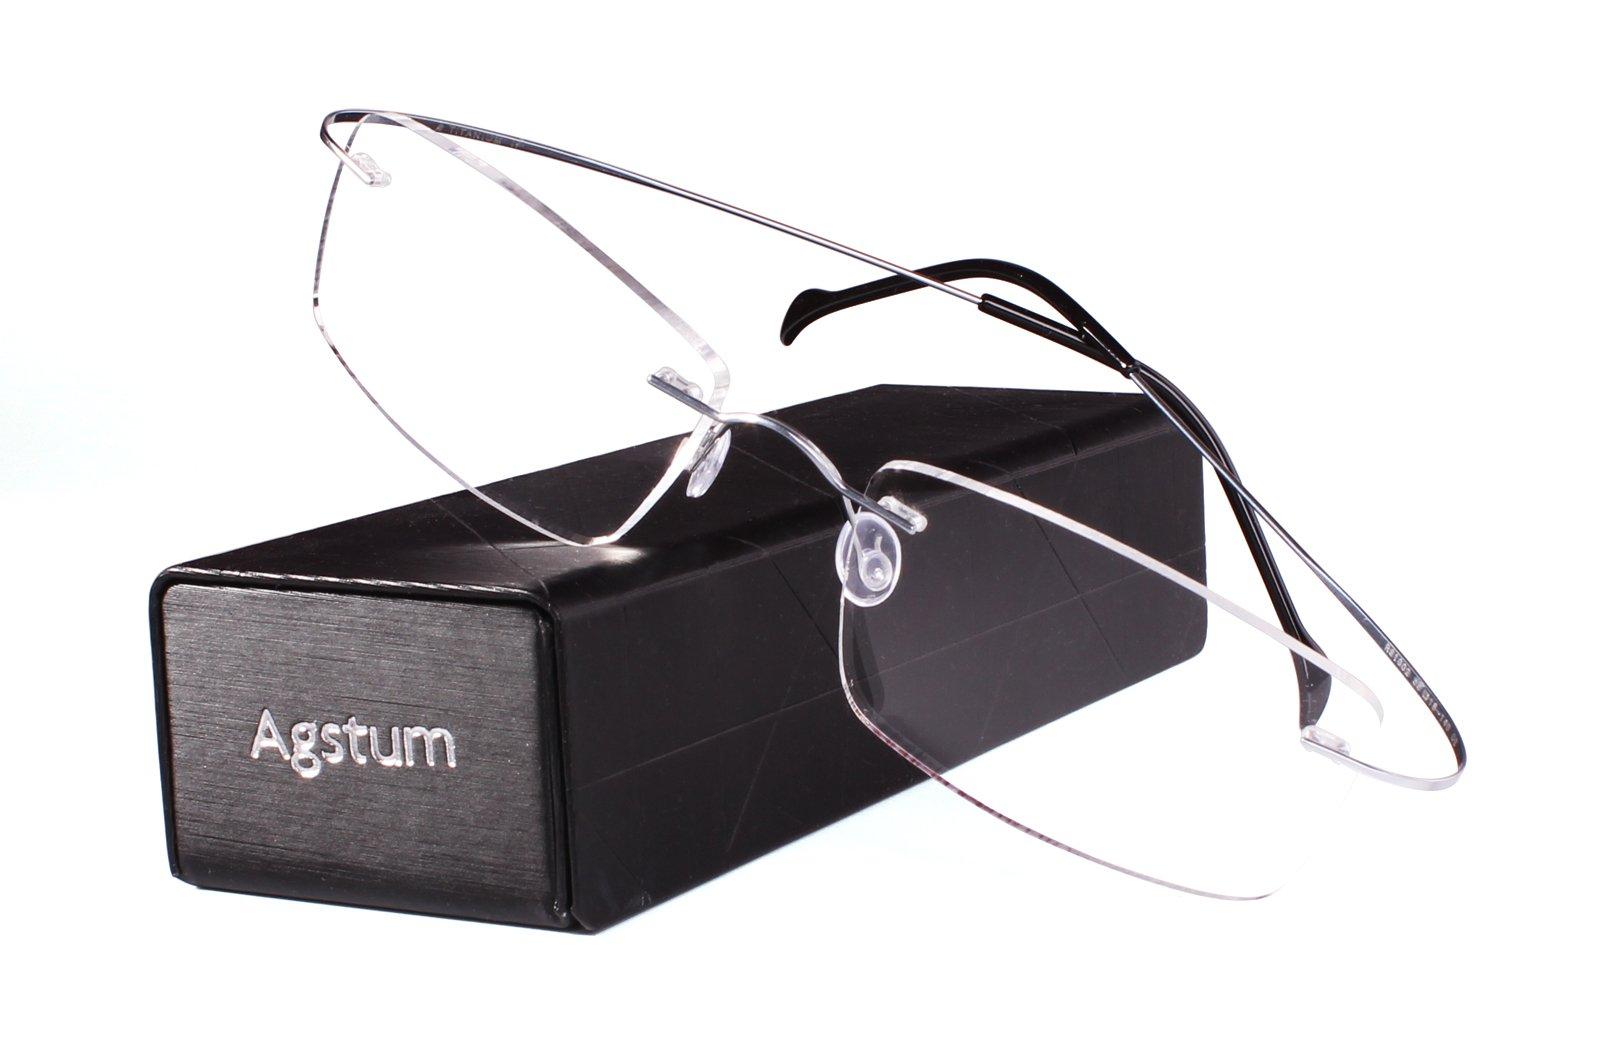 Agstum Pure Titanium Rimless Frame Prescription Hingeless Eyeglasses Rx (Silver, 55) by Agstum